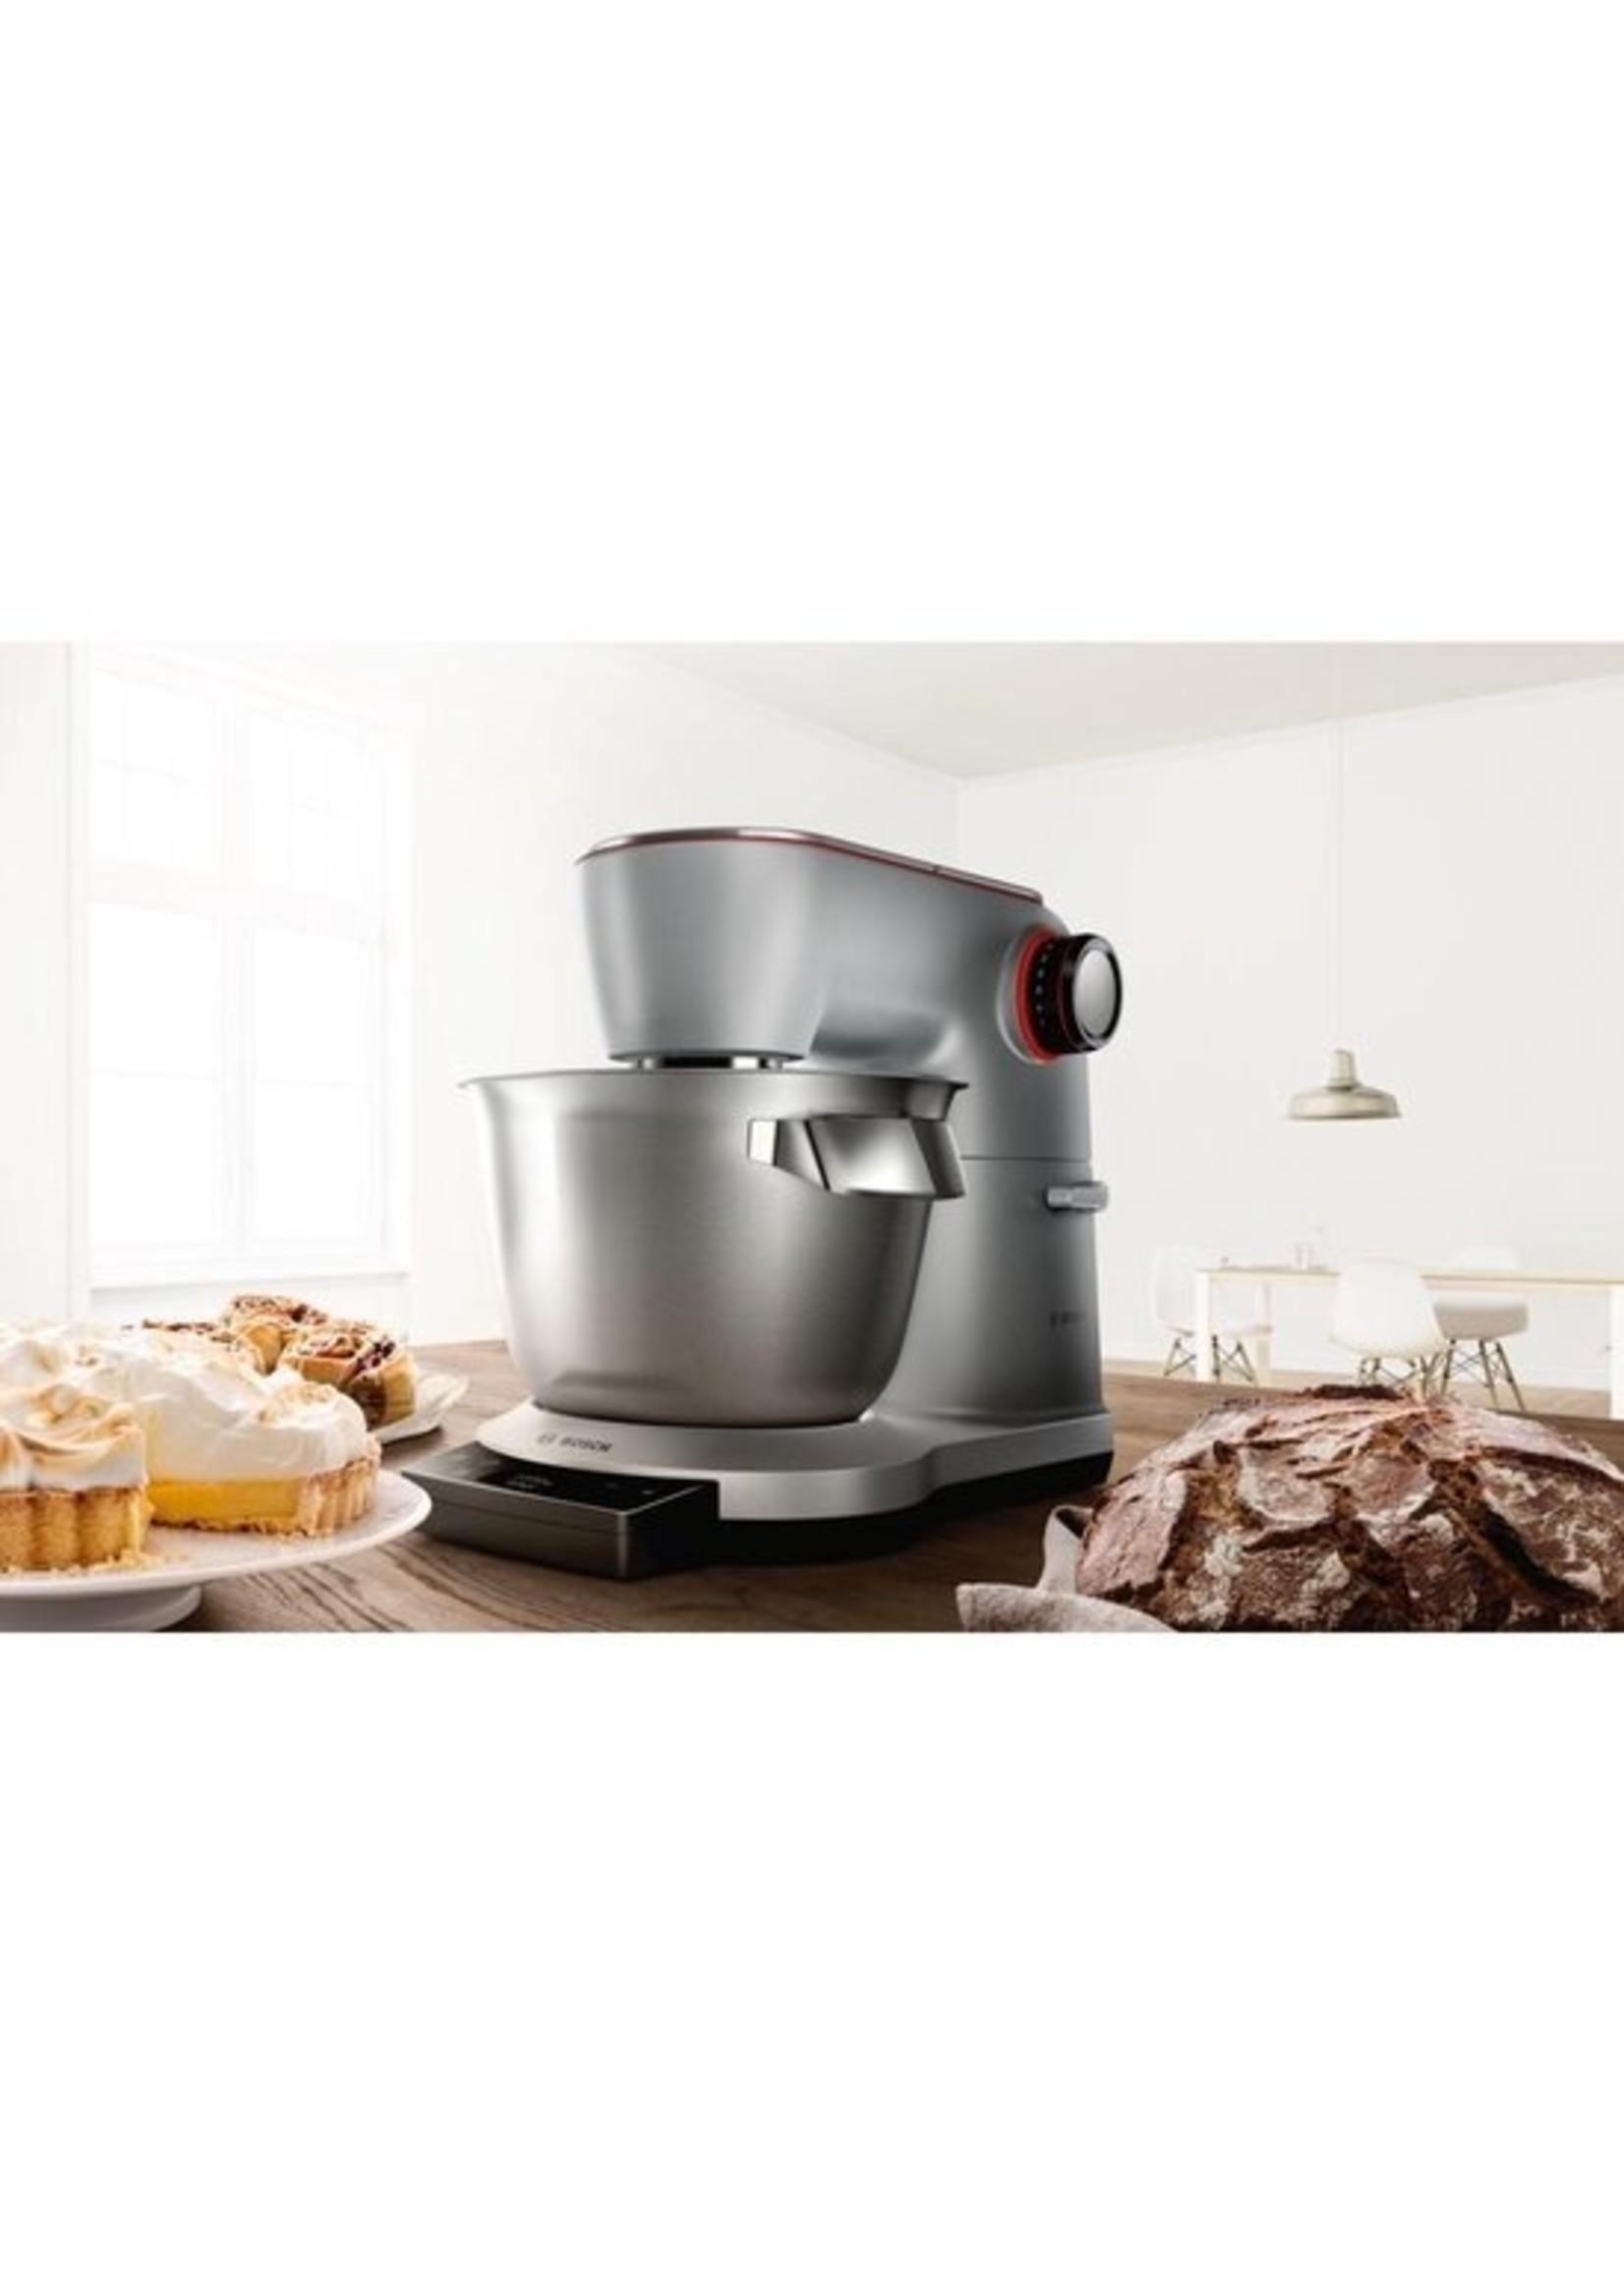 Bosch Bosch Optimum MUM9AX5S00 - Keukenmachine - Zilver koopjeshoek